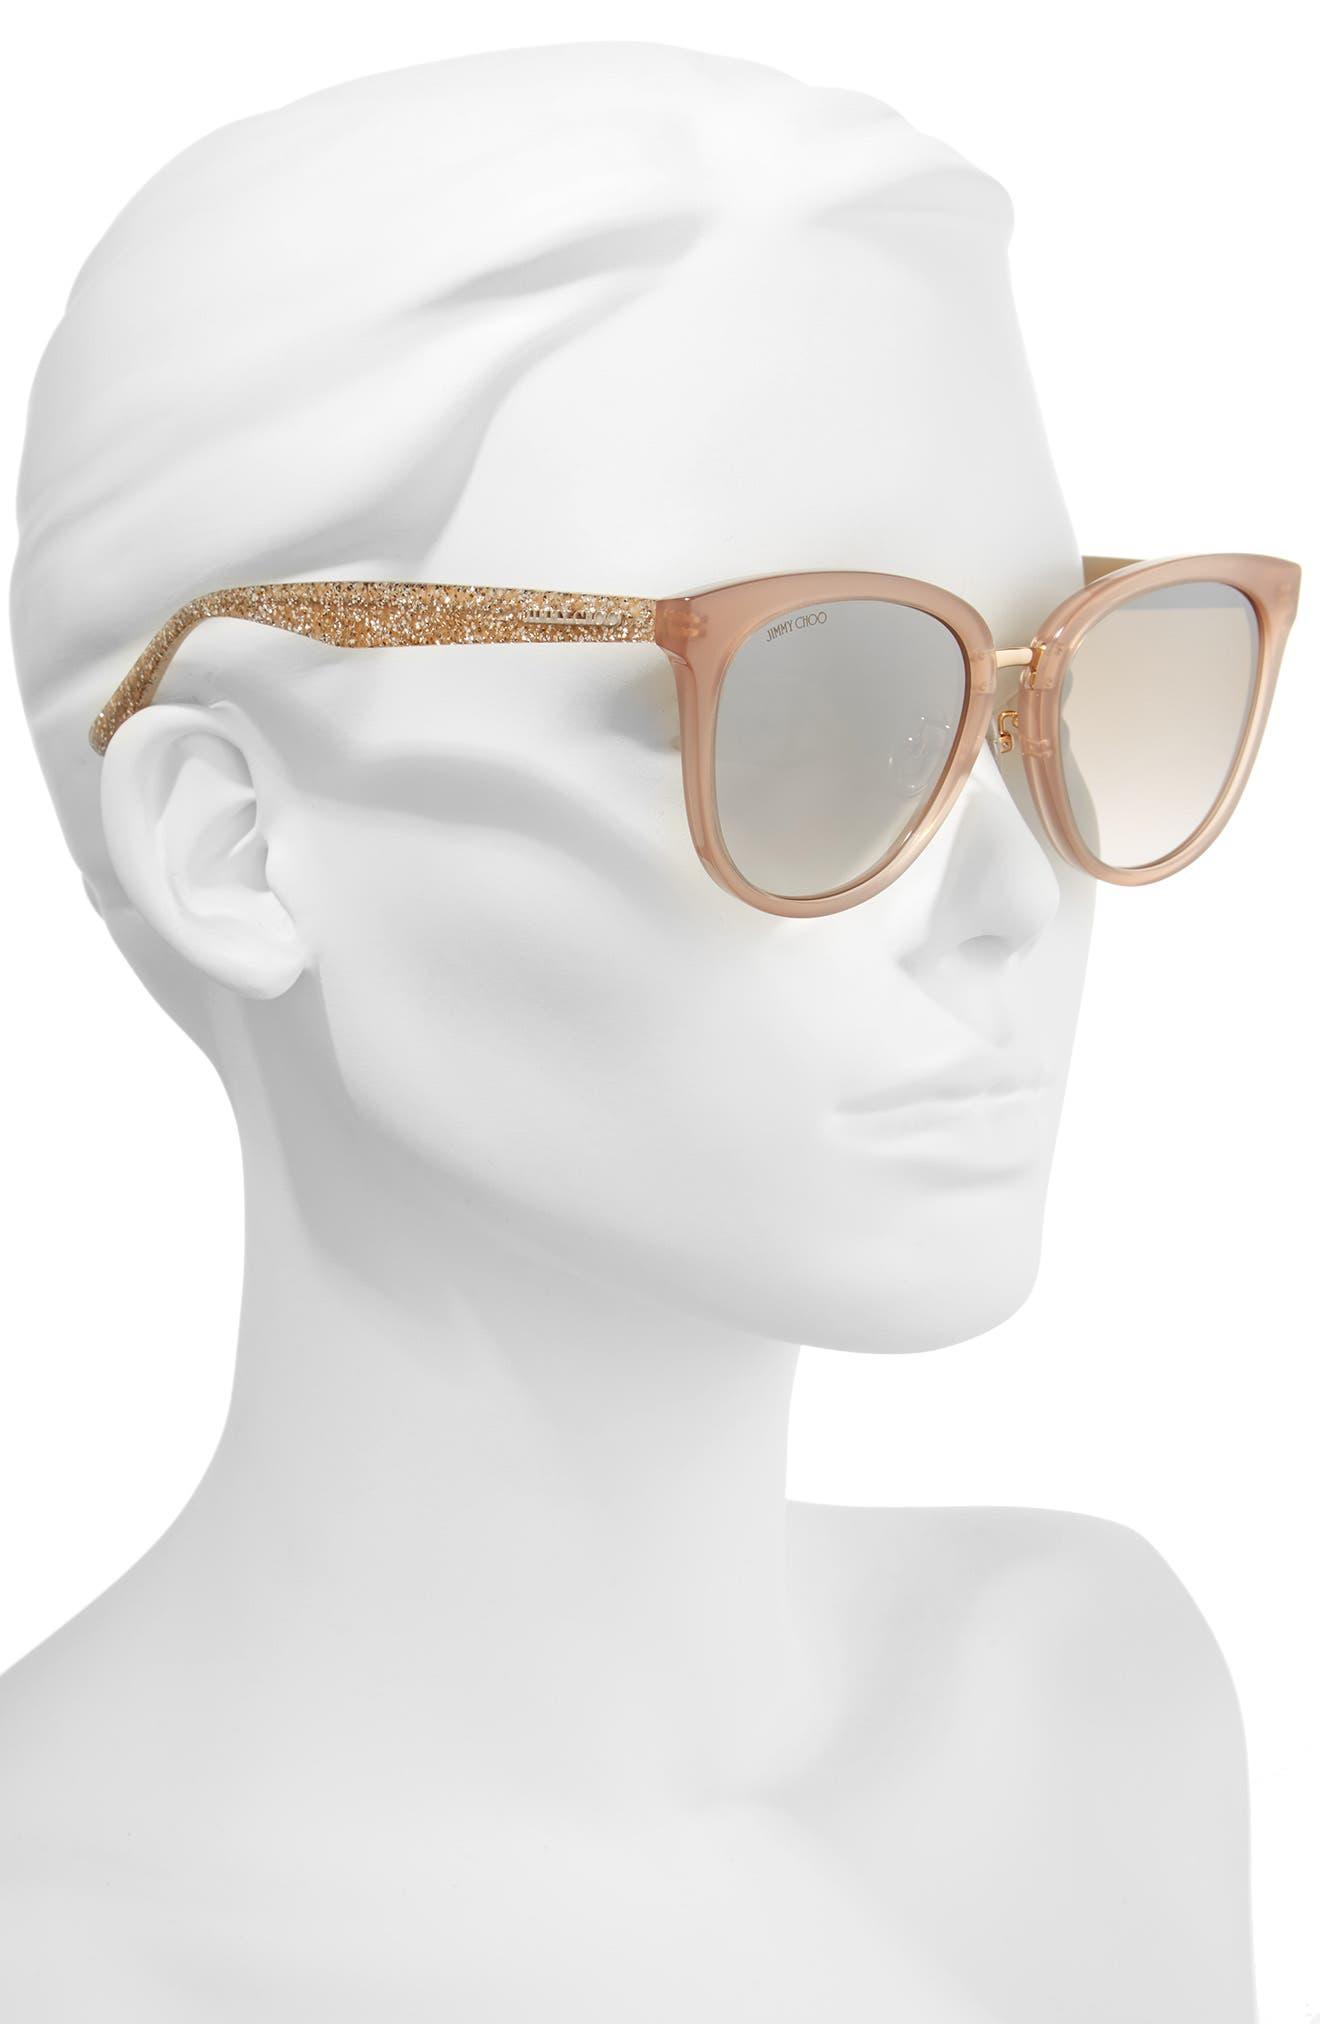 Cadefs 55mm Sunglasses,                             Alternate thumbnail 2, color,                             Nude Glitter Nude